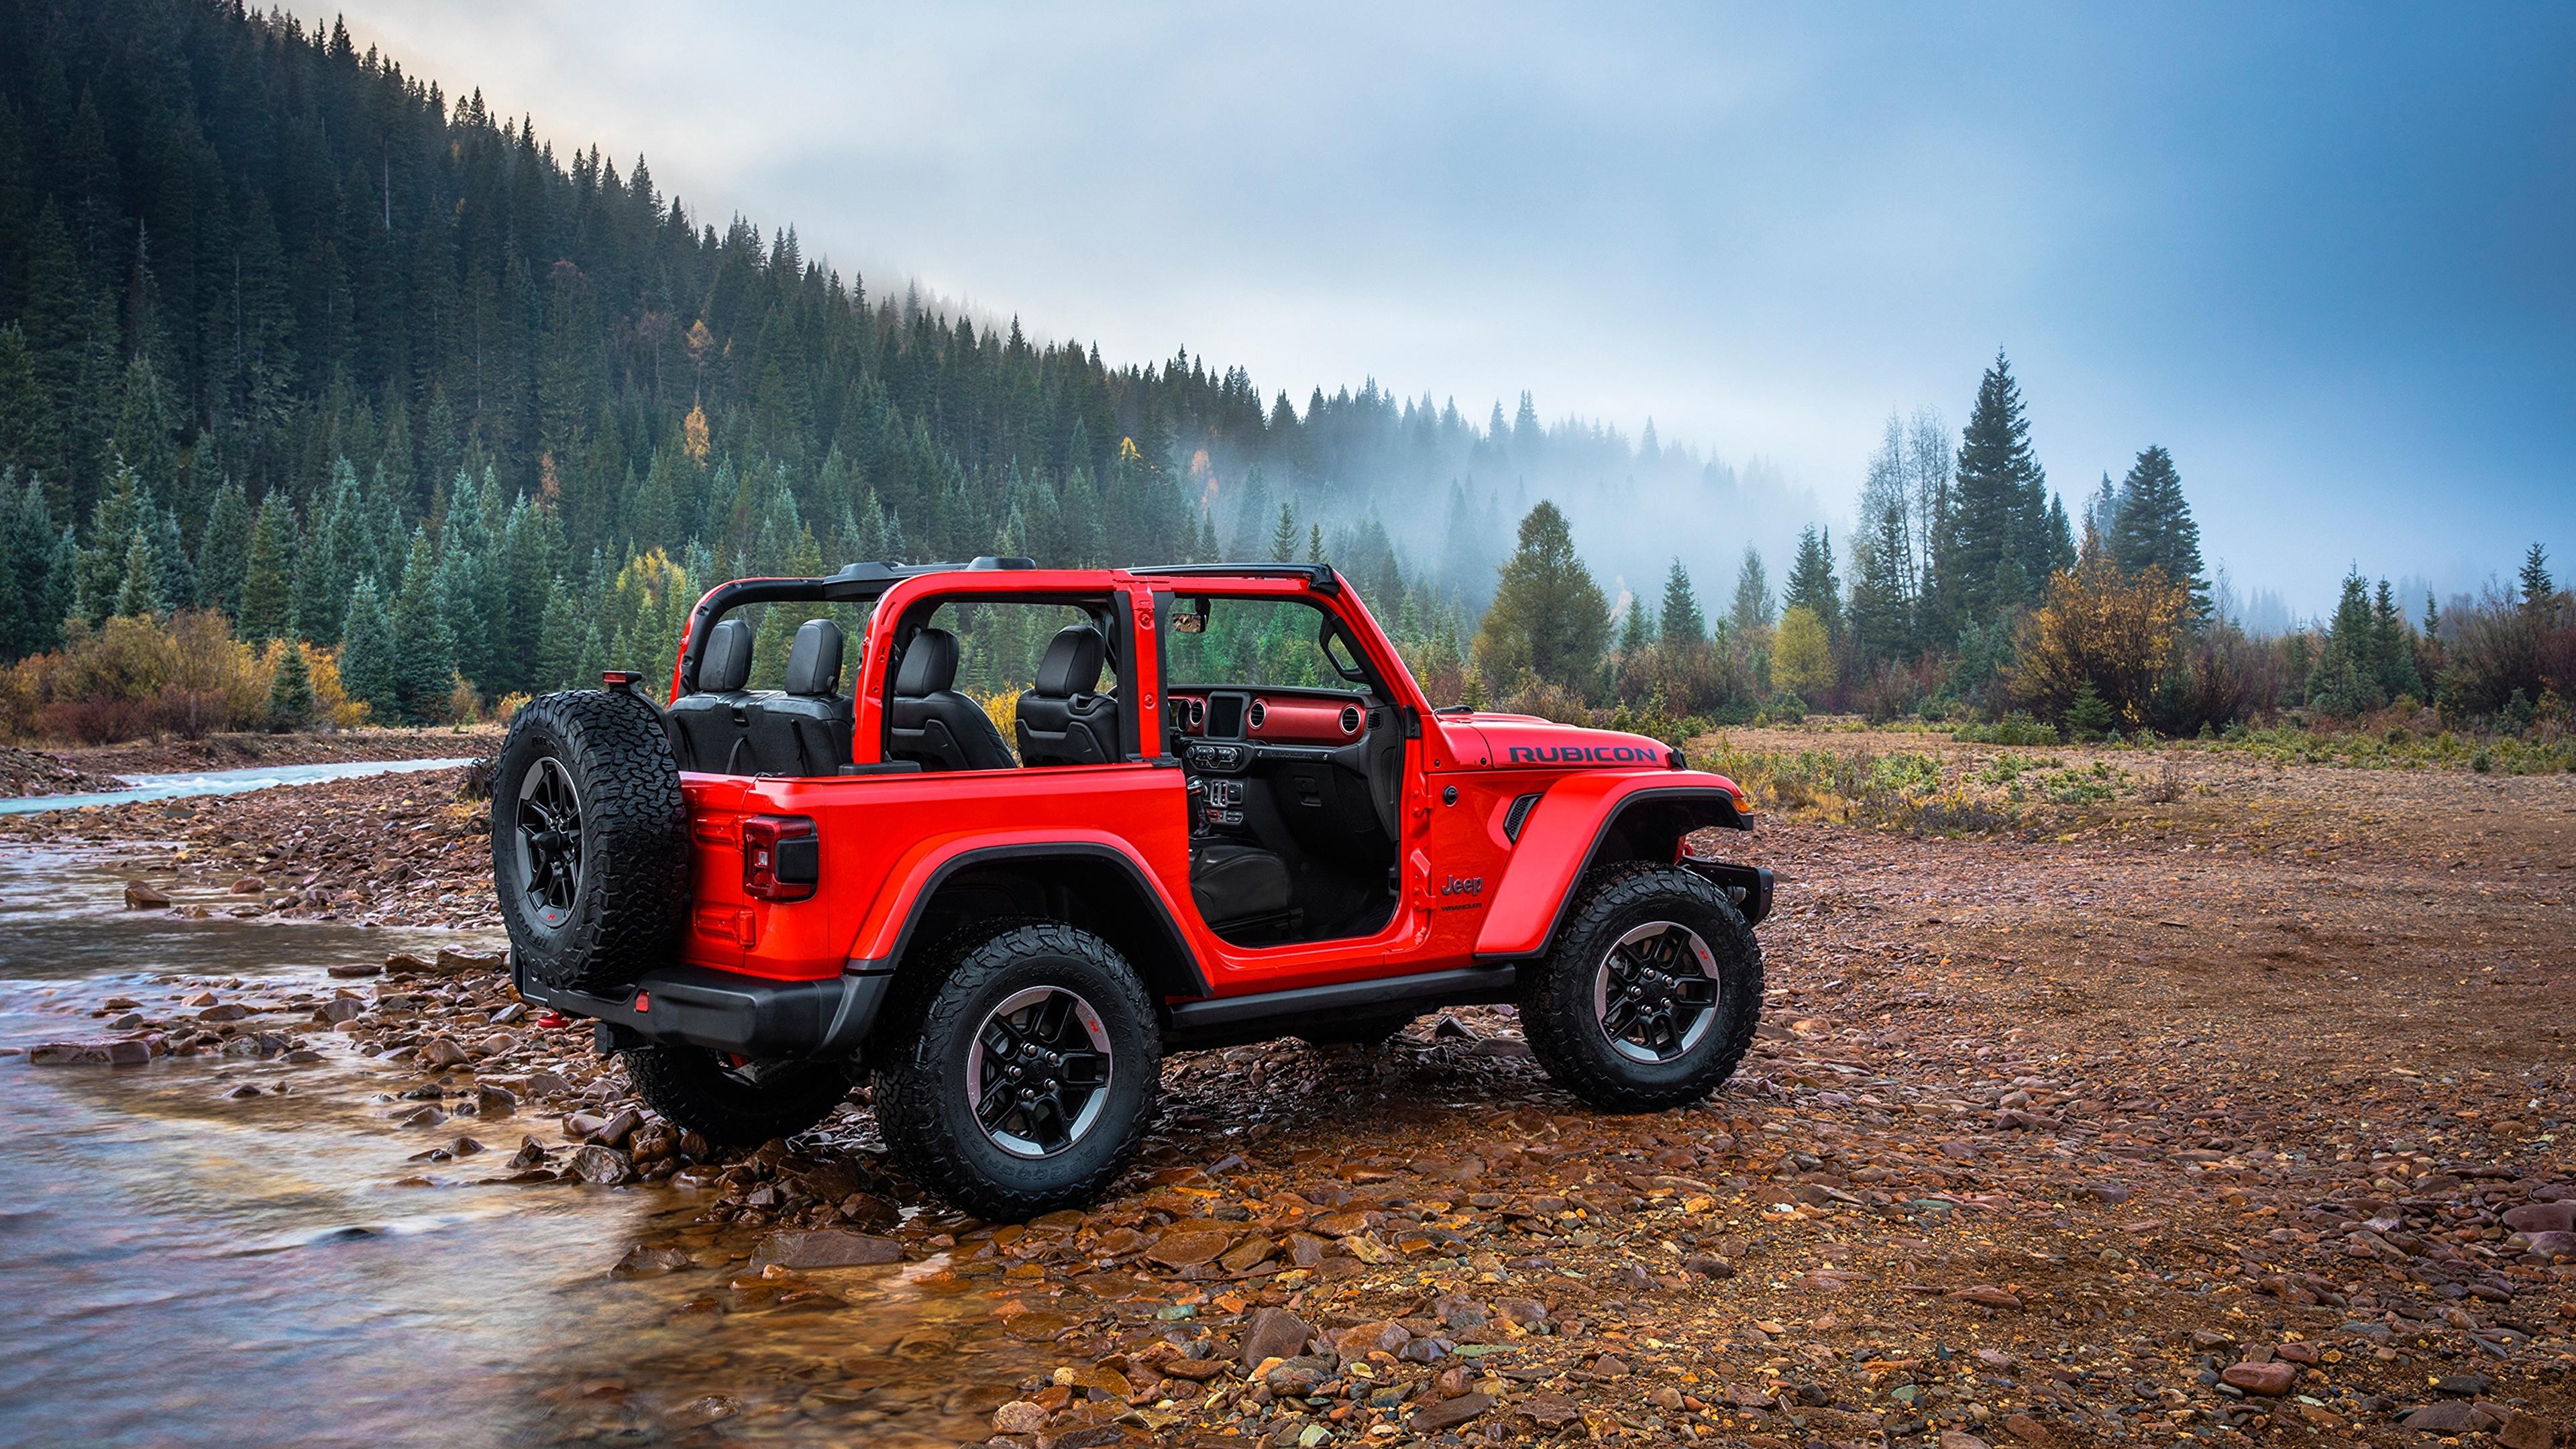 Picture Jeep SUV Wrangler Rubicon, 2018 Red Stones Rivers automobile 3840x2160 Sport utility vehicle Cars auto stone river